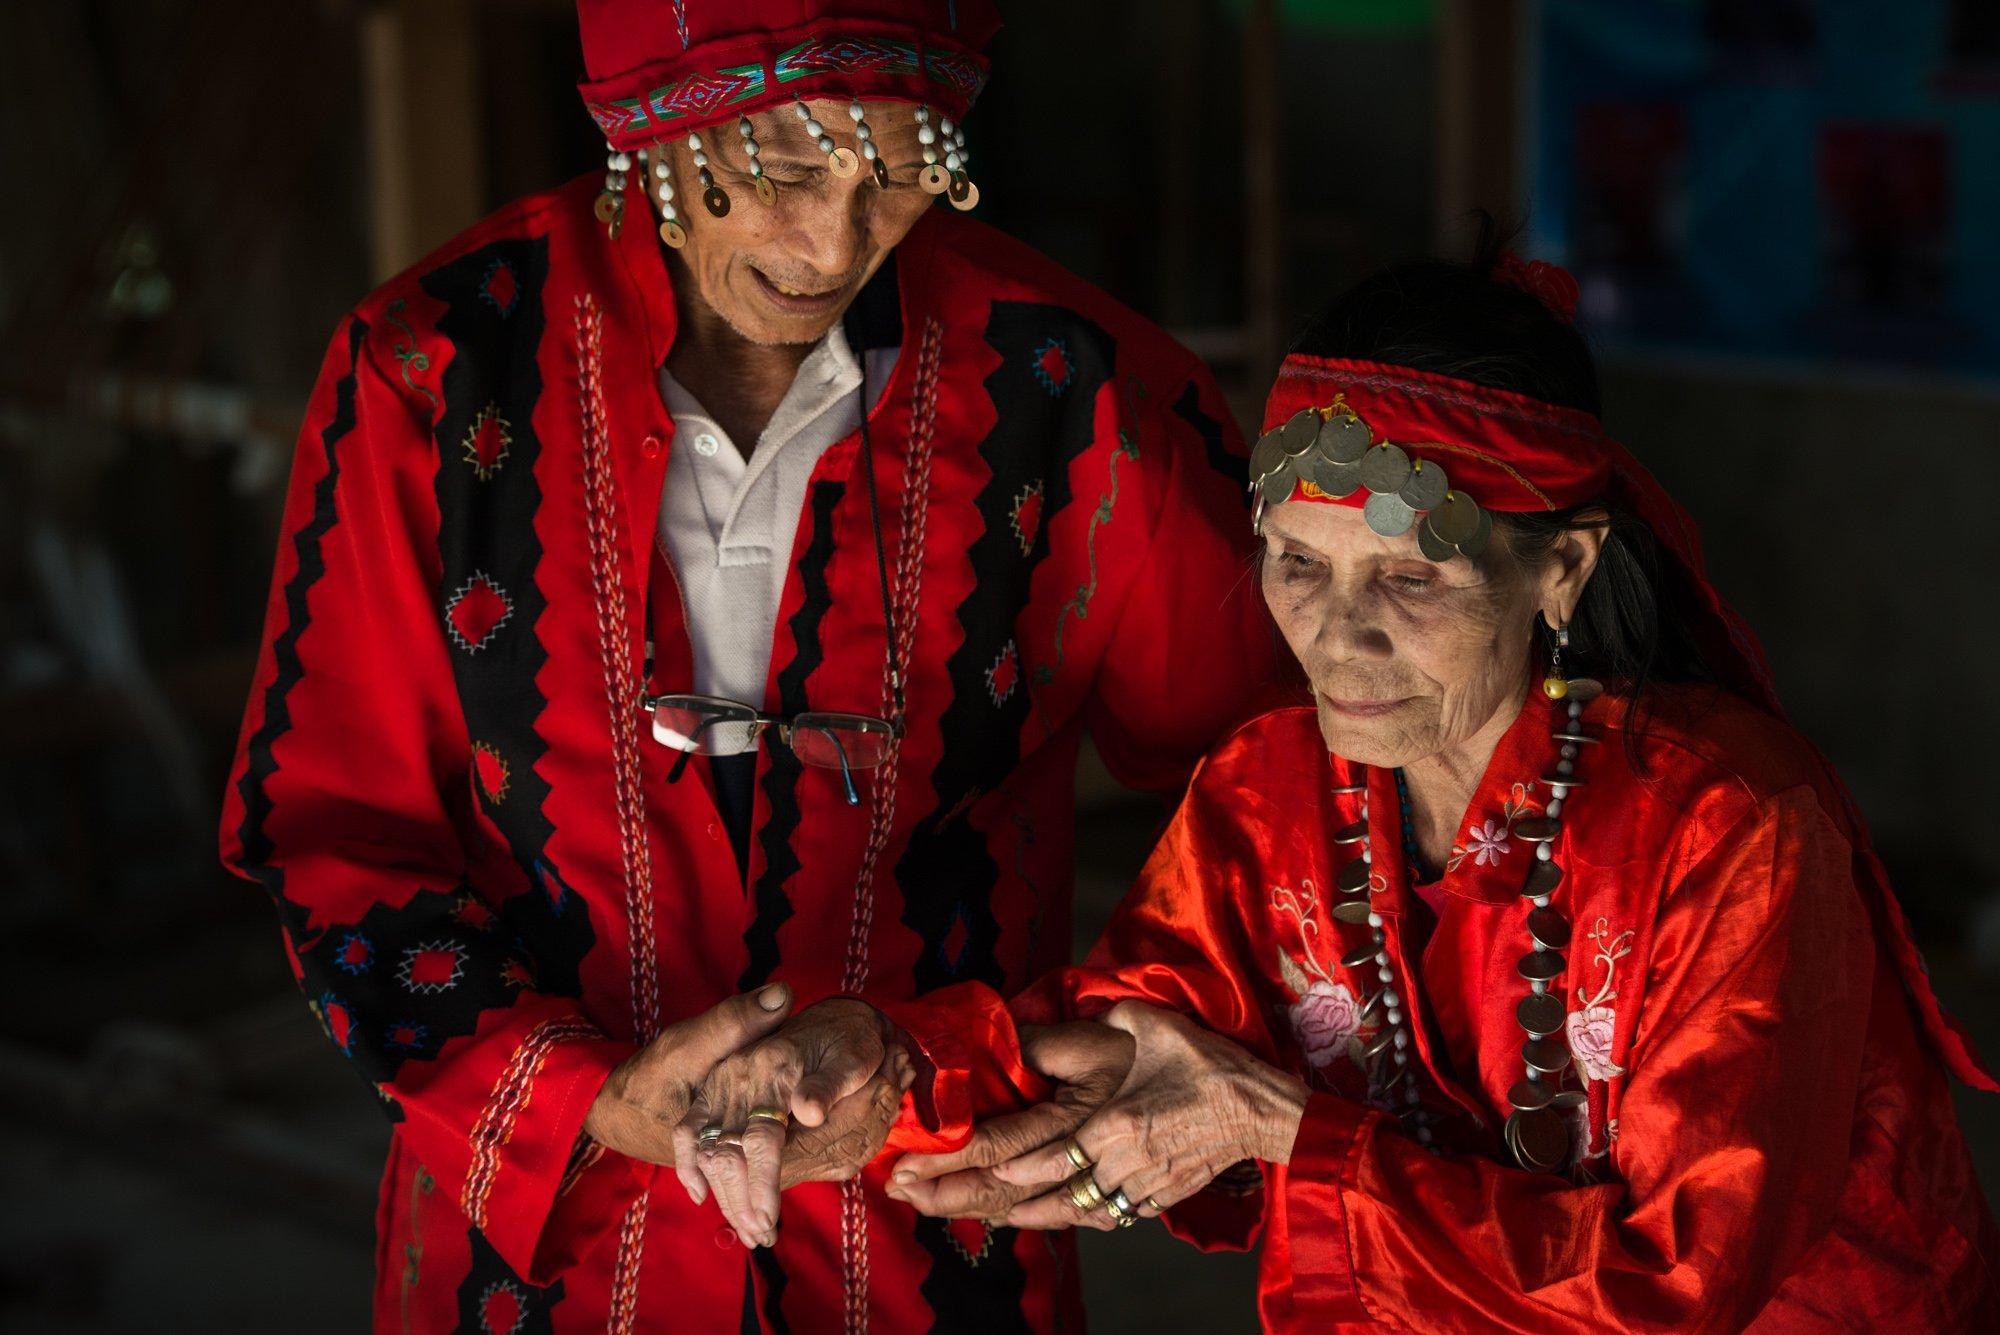 The Ati & Tumandok People of Panay Island | Travel